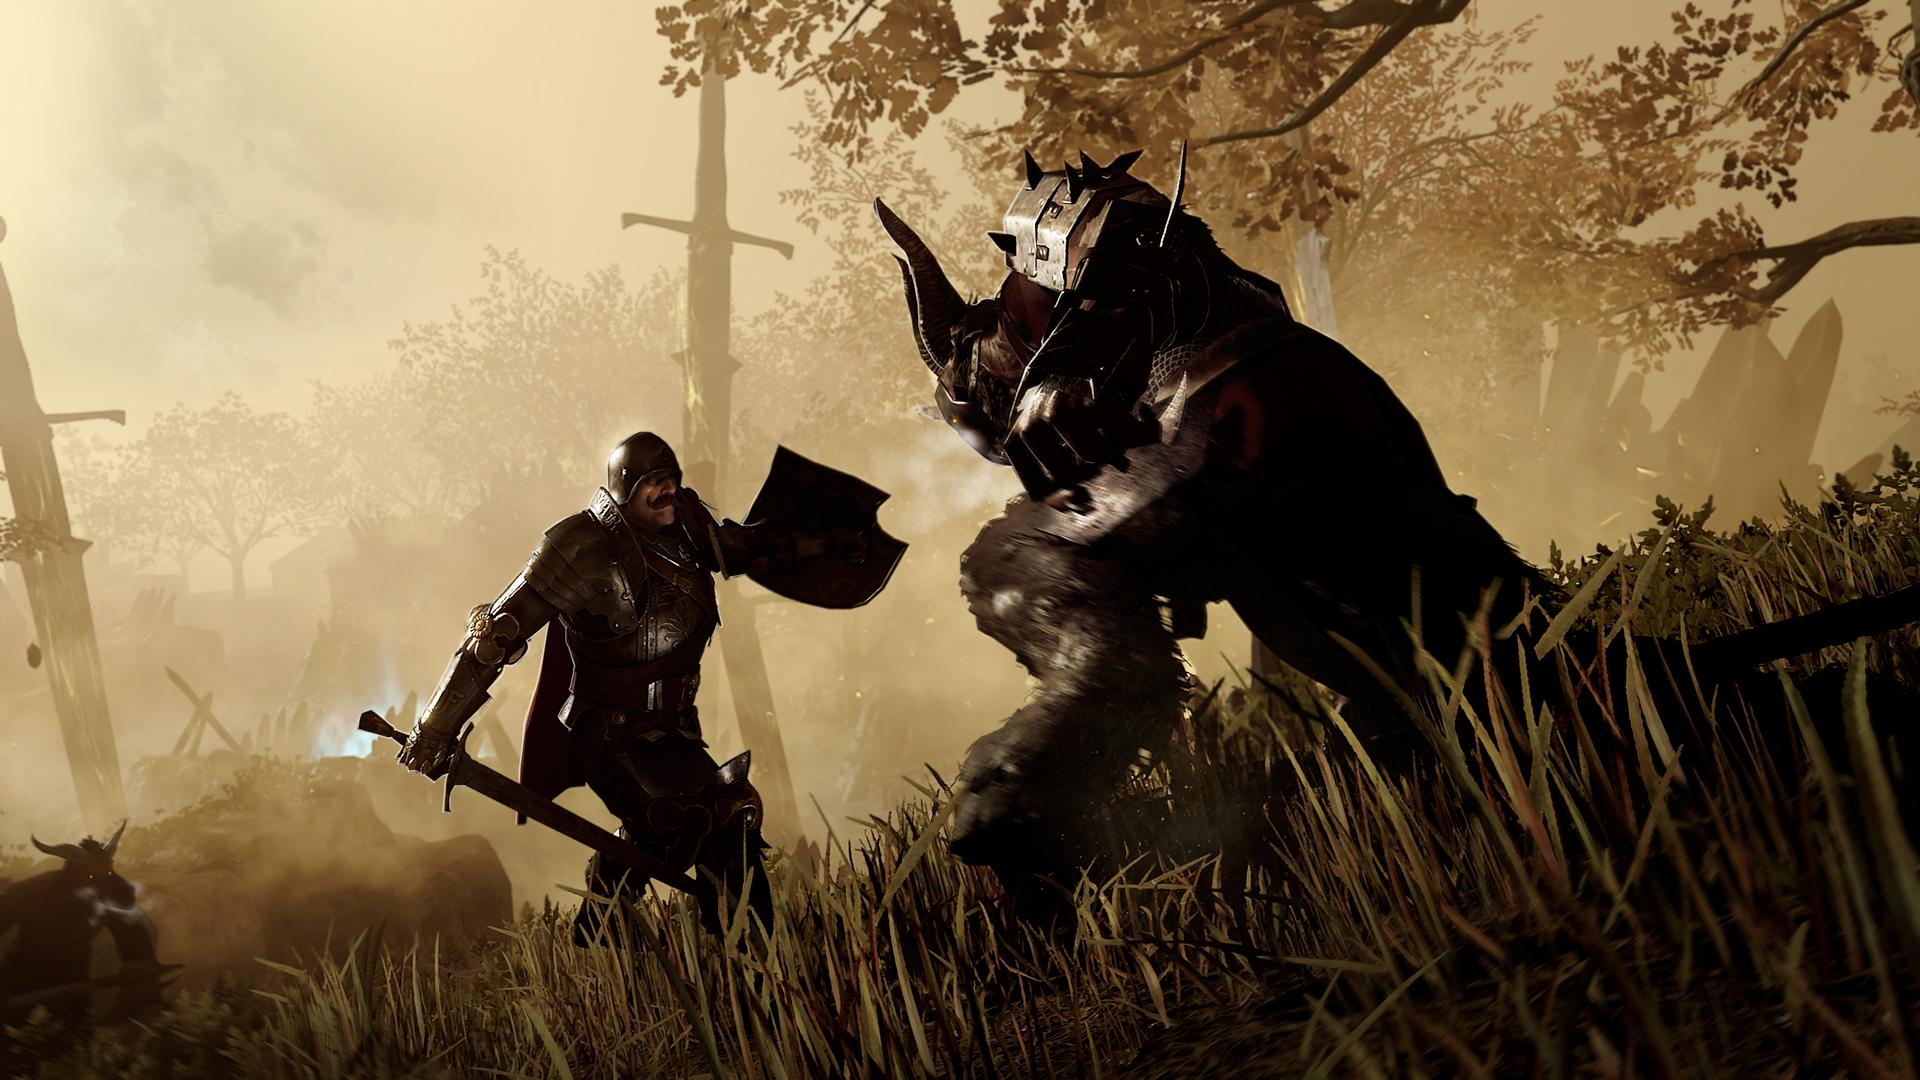 Warhammer: Vermintide 2's Endgame Just Got Way More Interesting